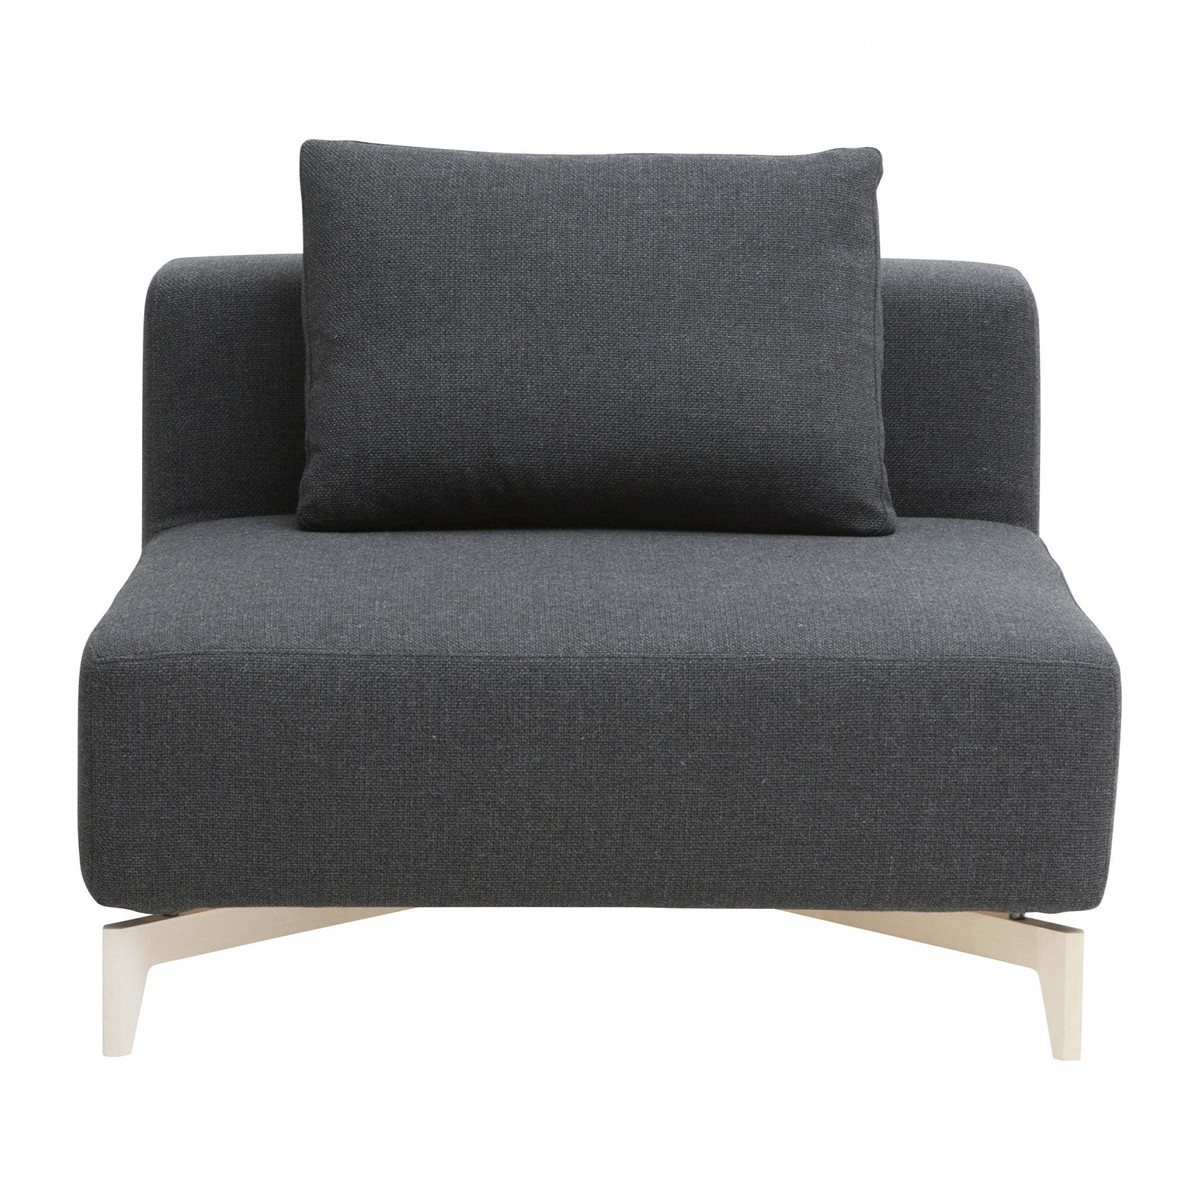 Softline Sofa Sleep Day Bed Ambientedirect